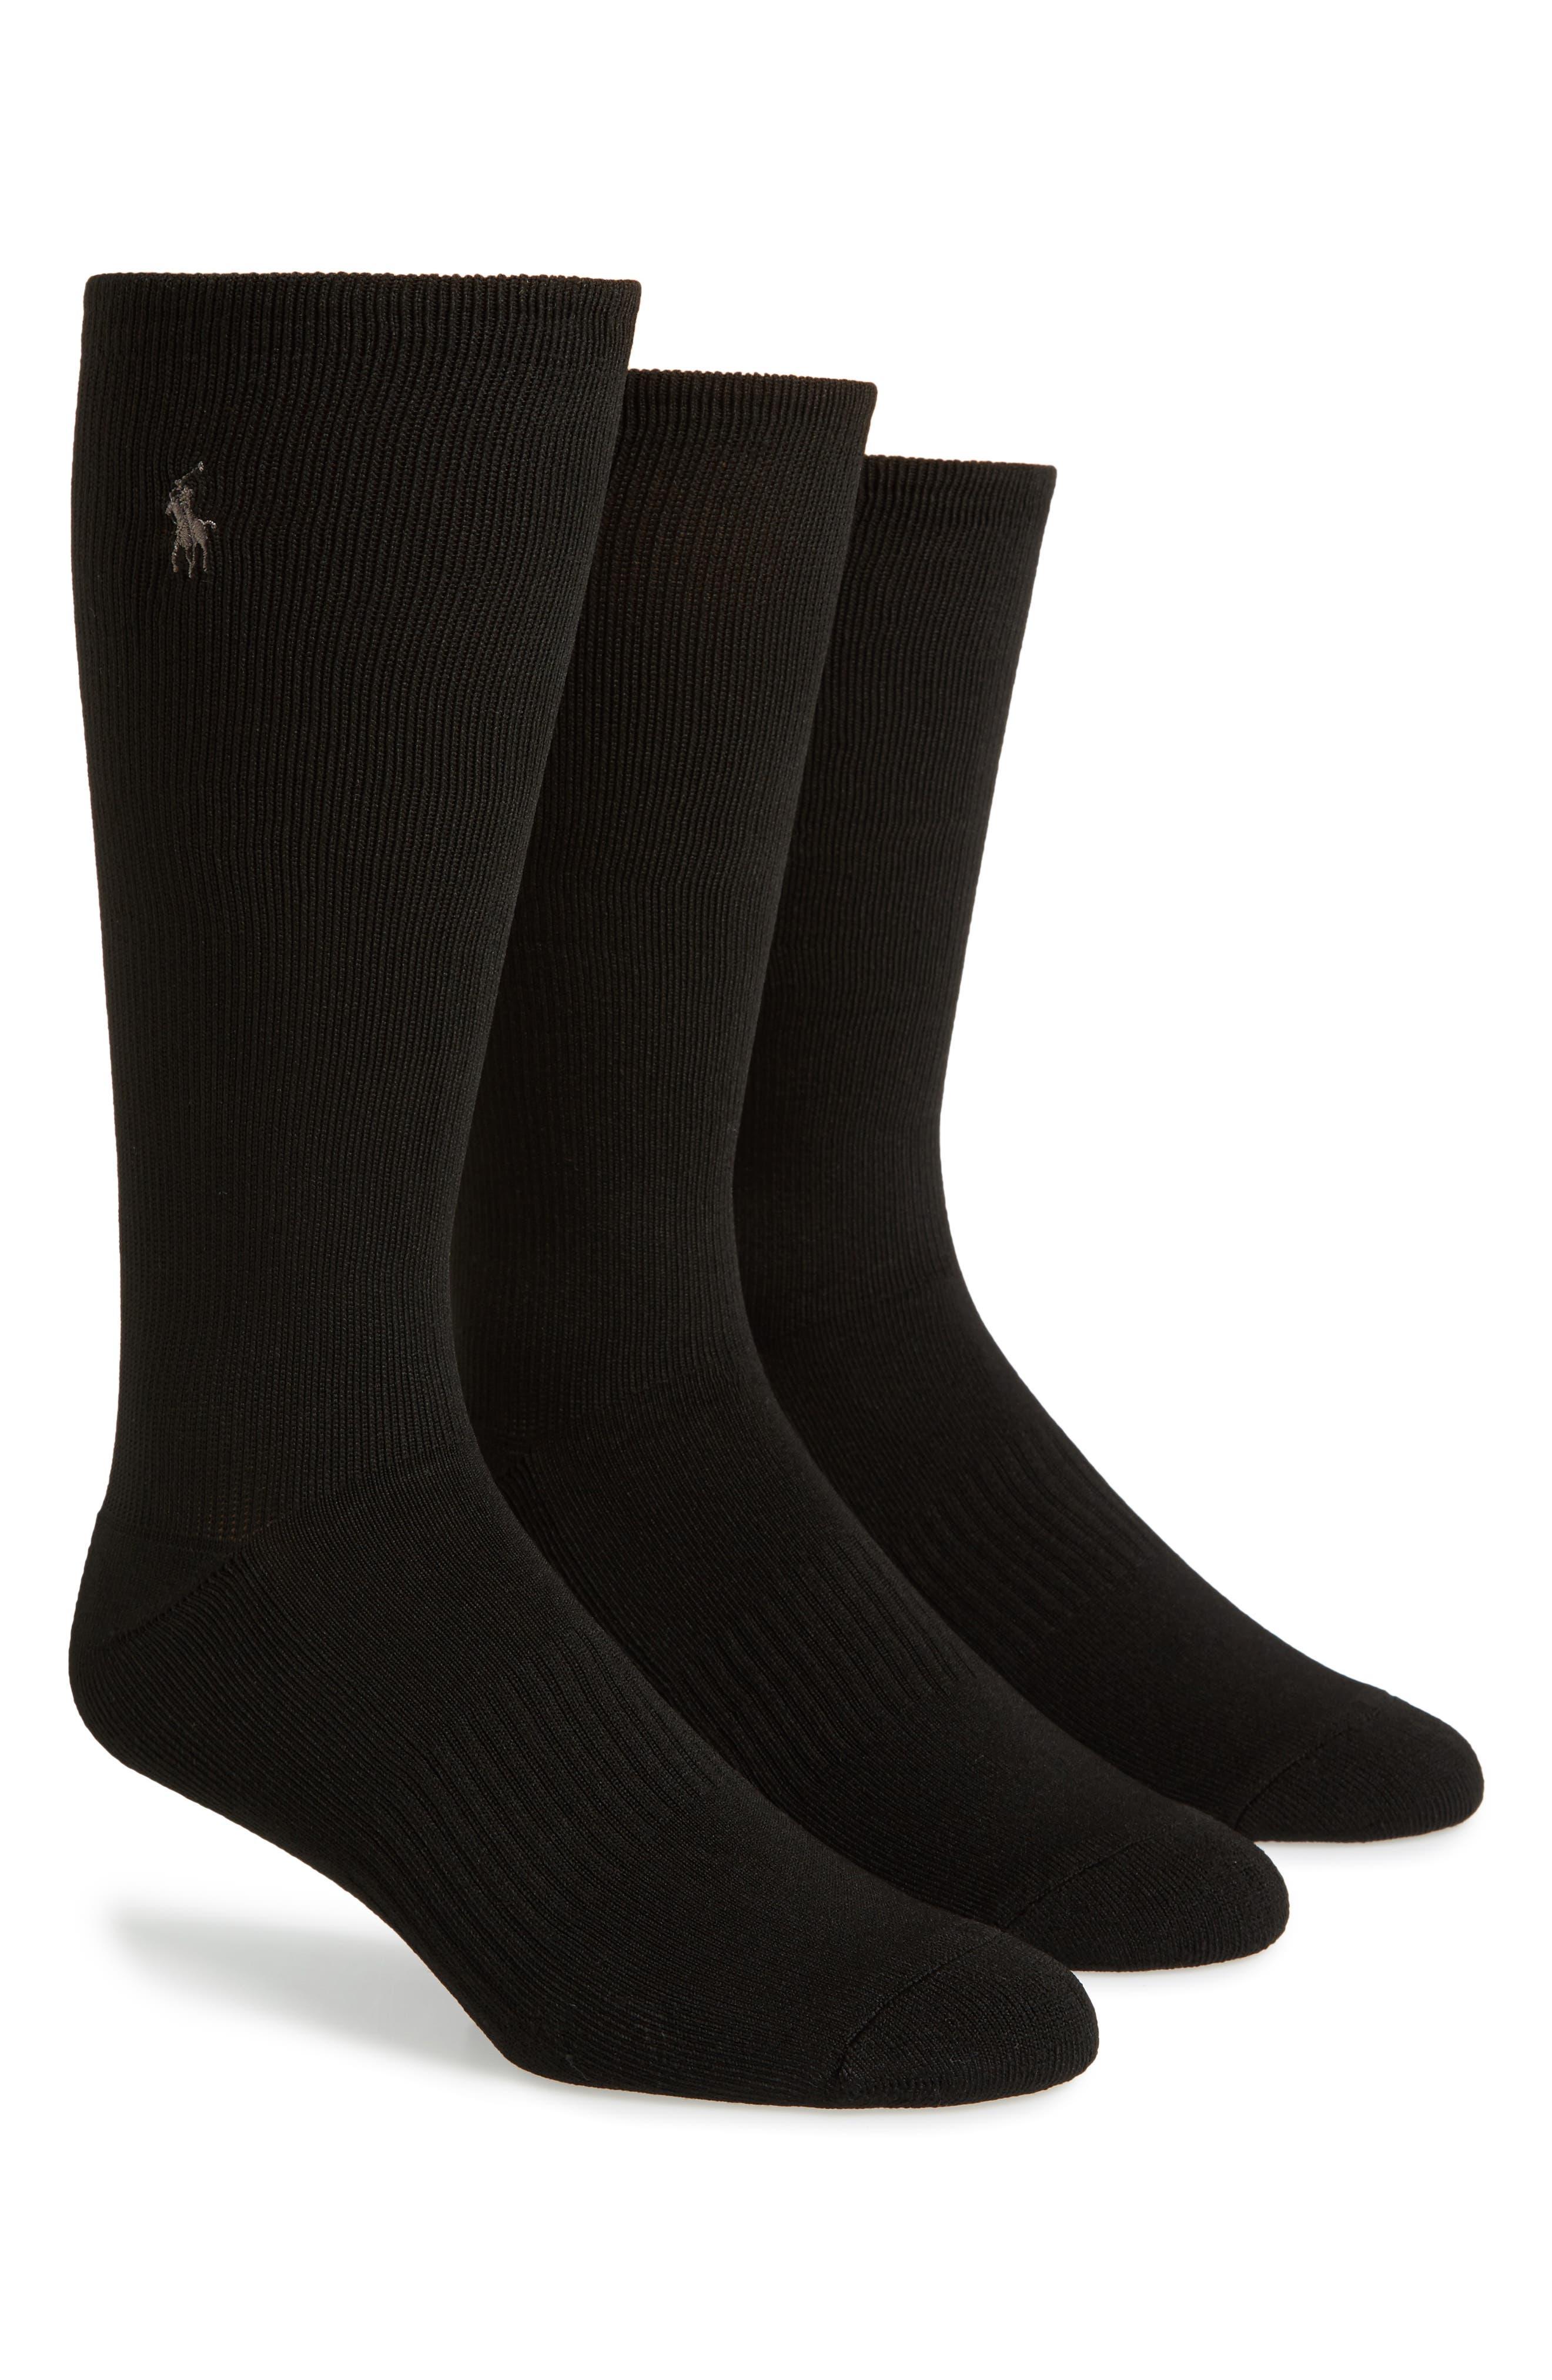 Polo Ralph Lauren 3-Pack Compression Socks